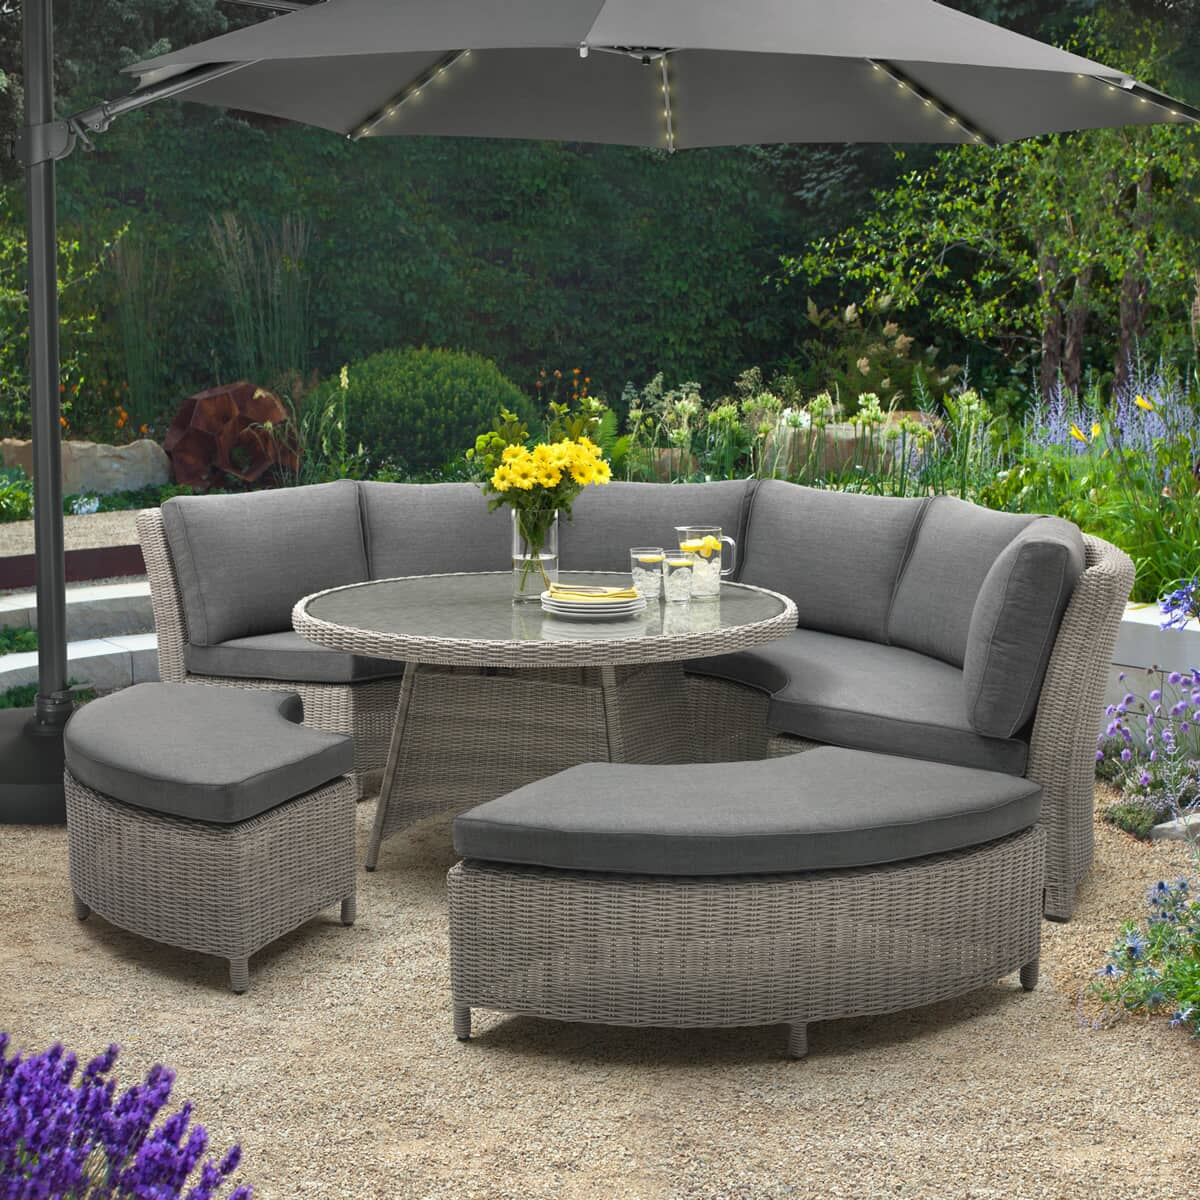 Kettler 3 5m Free Arm Parasol With Led Lights Bluetooth Speaker Pl35 183c Bt Garden Furniture World